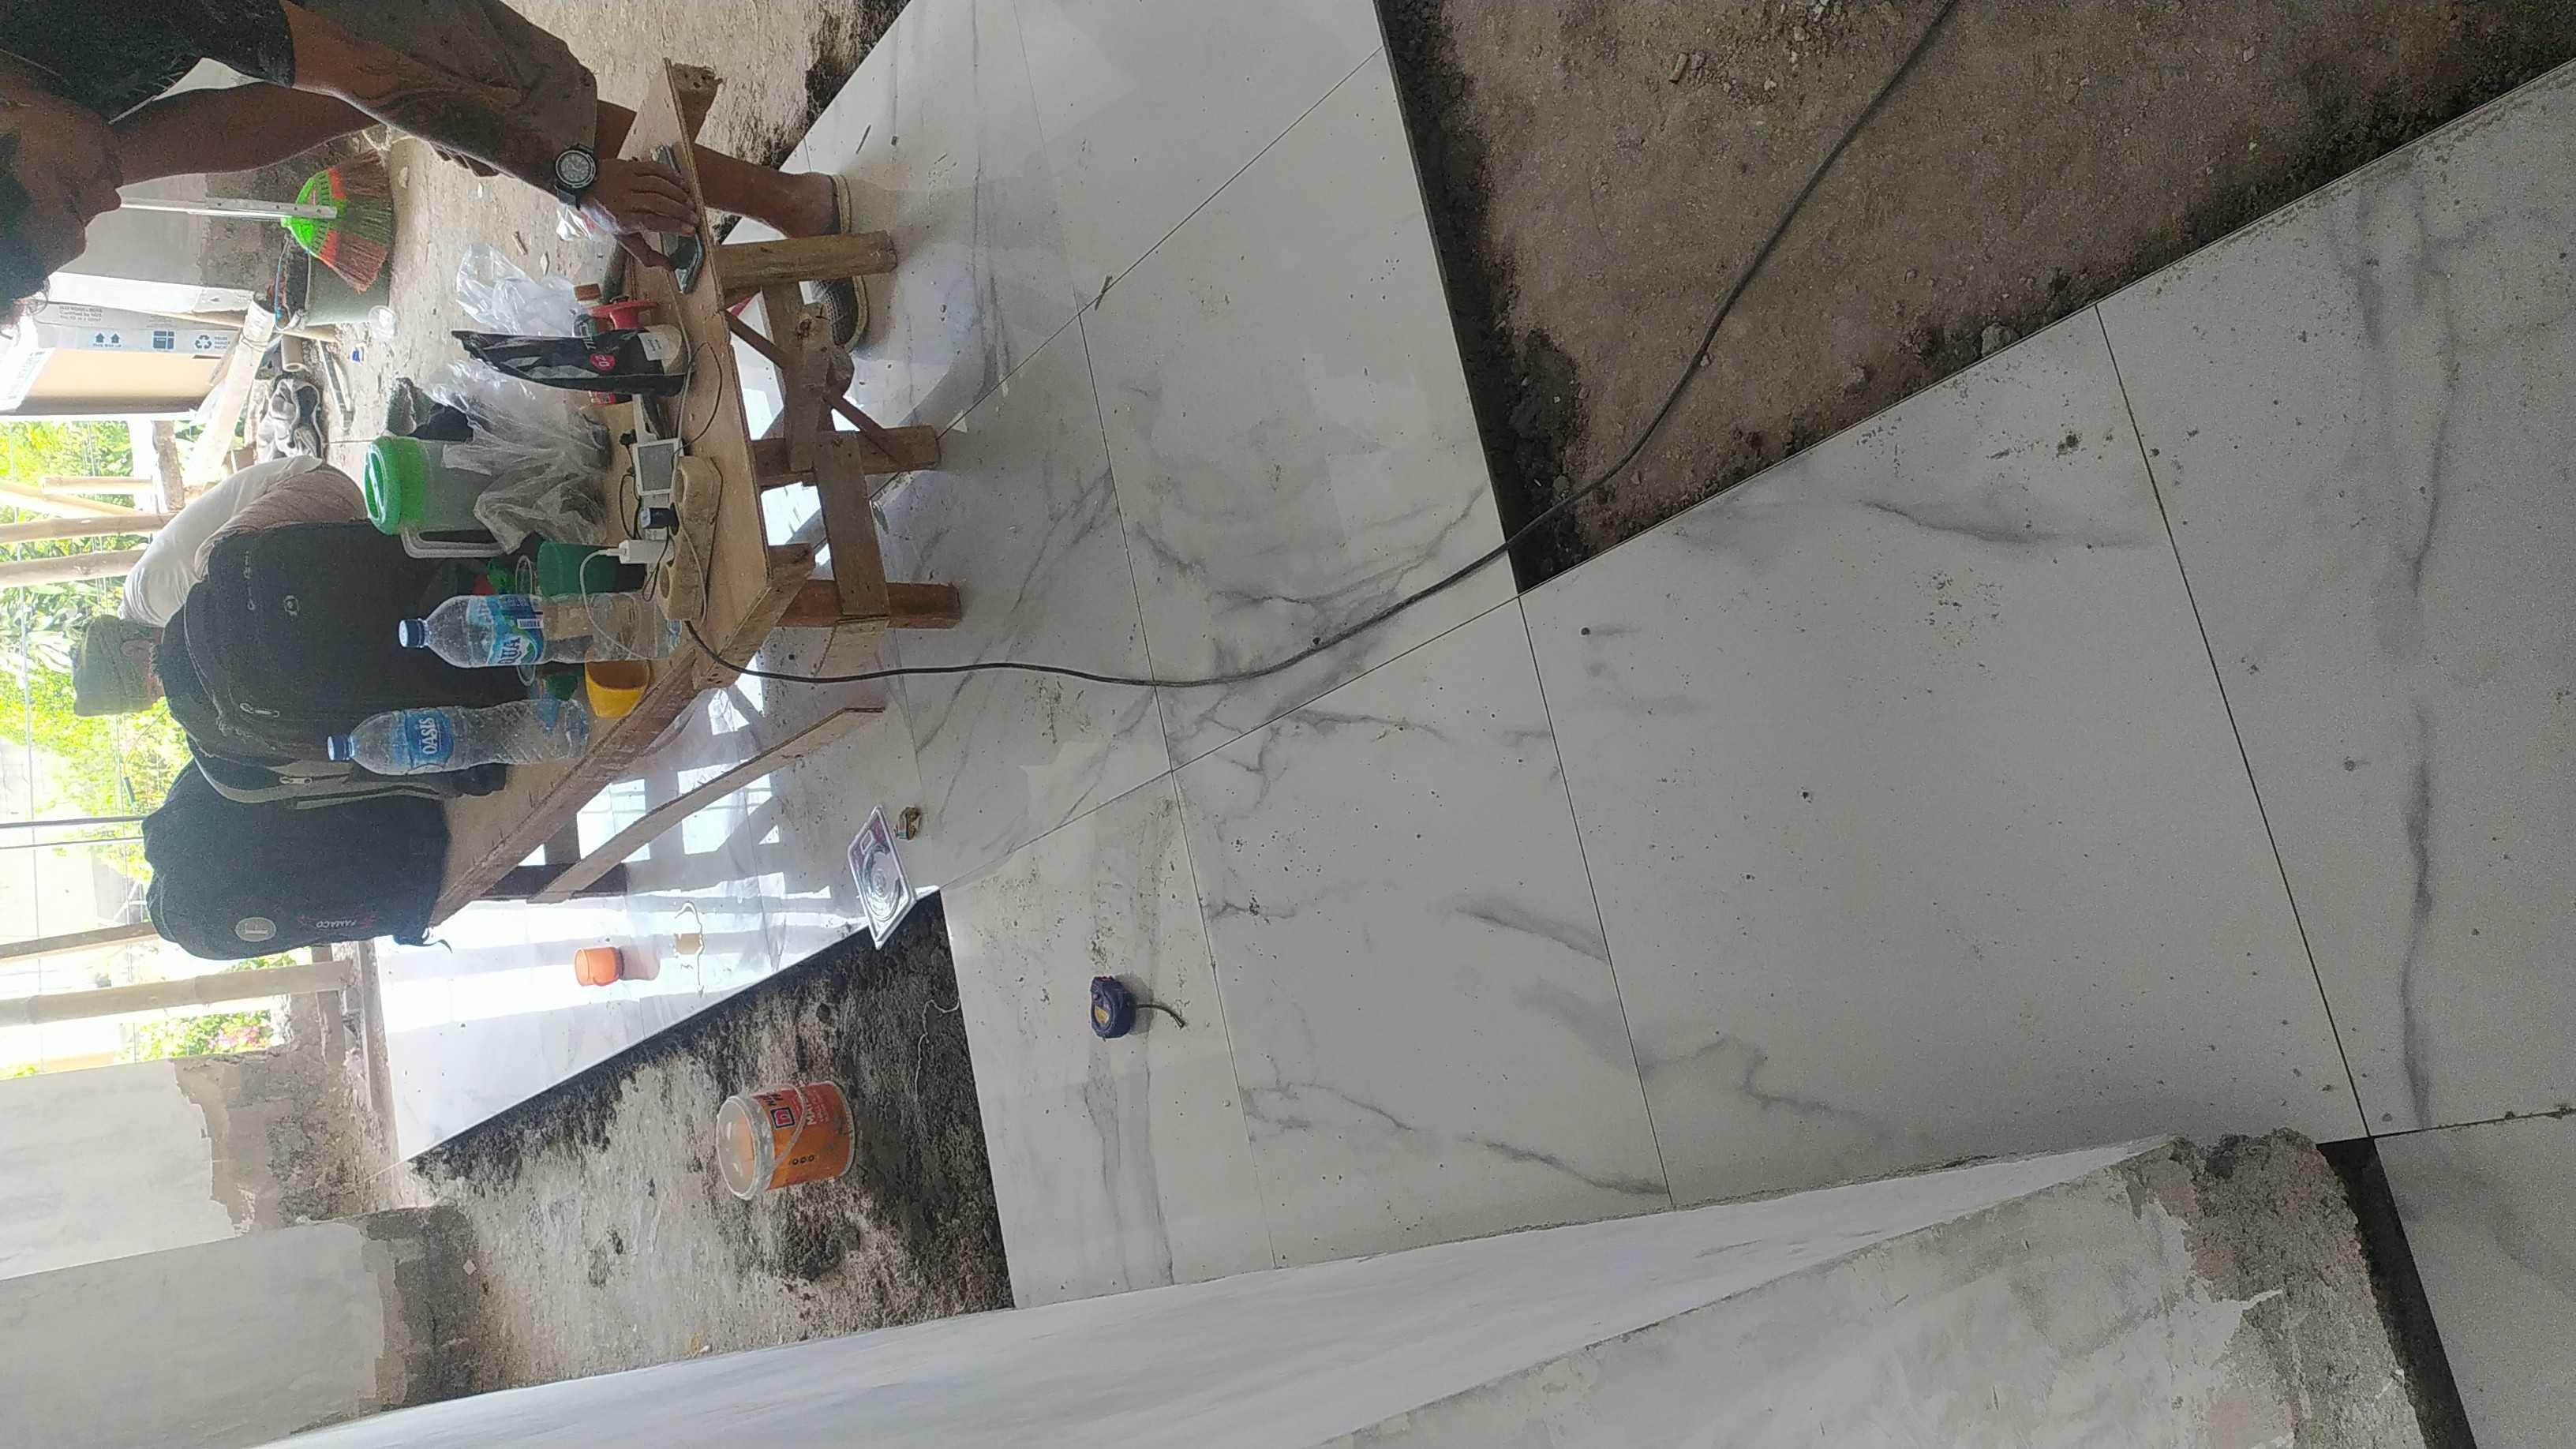 Mahesa Jaya Bangun Rumah 3 Lantai Gandul, Kec. Cinere, Kota Depok, Jawa Barat, Indonesia Gandul, Kec. Cinere, Kota Depok, Jawa Barat, Indonesia Mahesa-Jaya-Bangun-Rumah-3-Lantai   118698